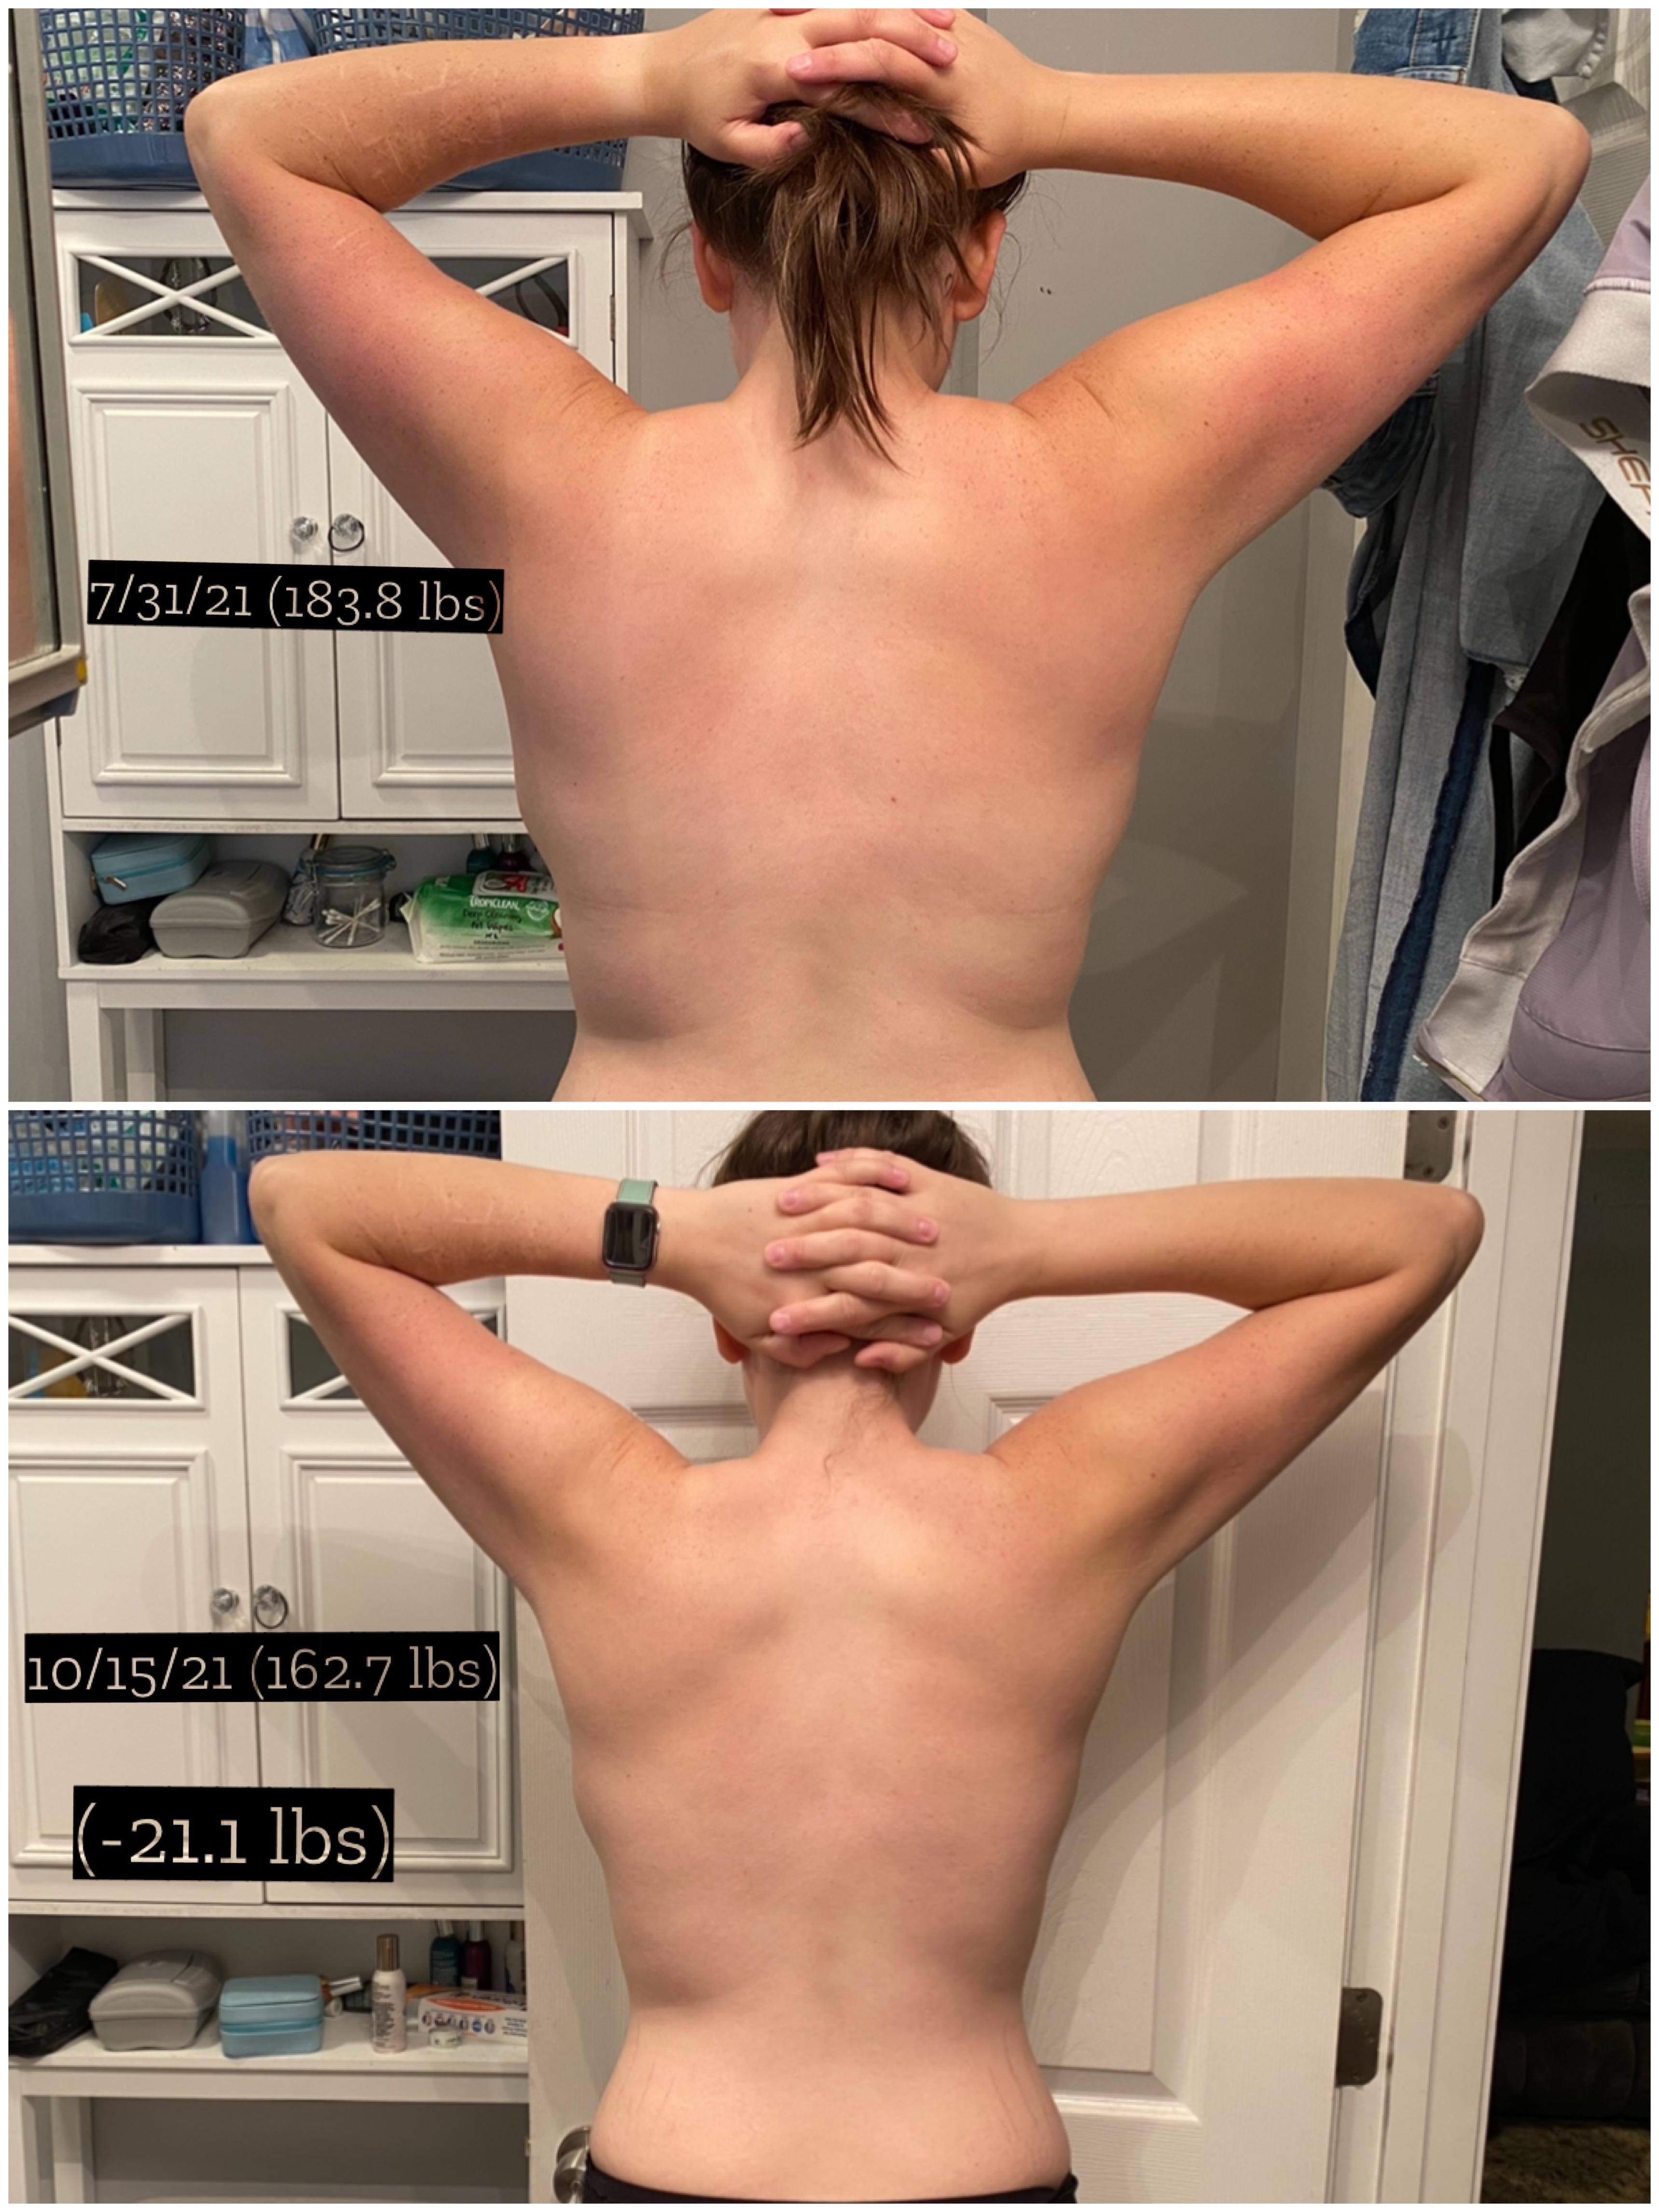 5'9 Female 21 lbs Weight Loss 183 lbs to 162 lbs